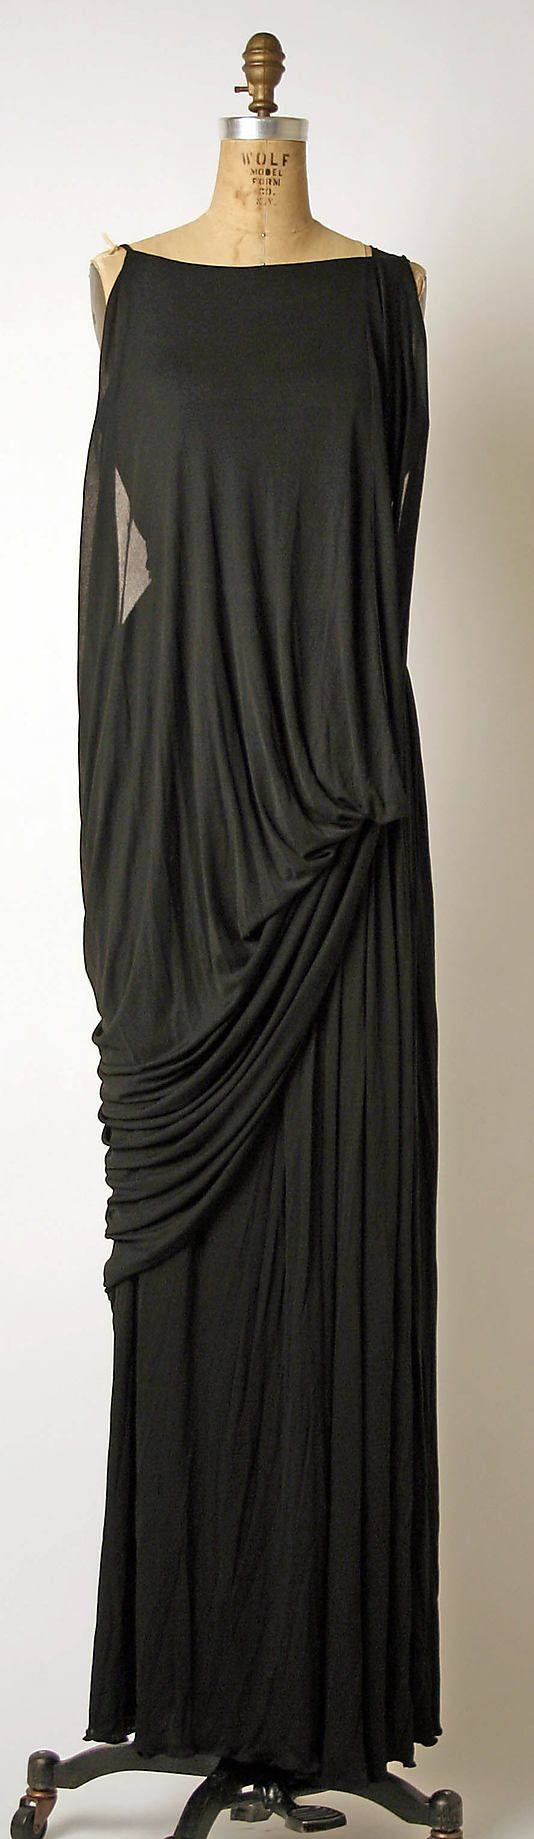 Madame Grès (Alix Barton) (French, Paris 1903–1993 Var region)  Date: late 1960s–mid-1980s